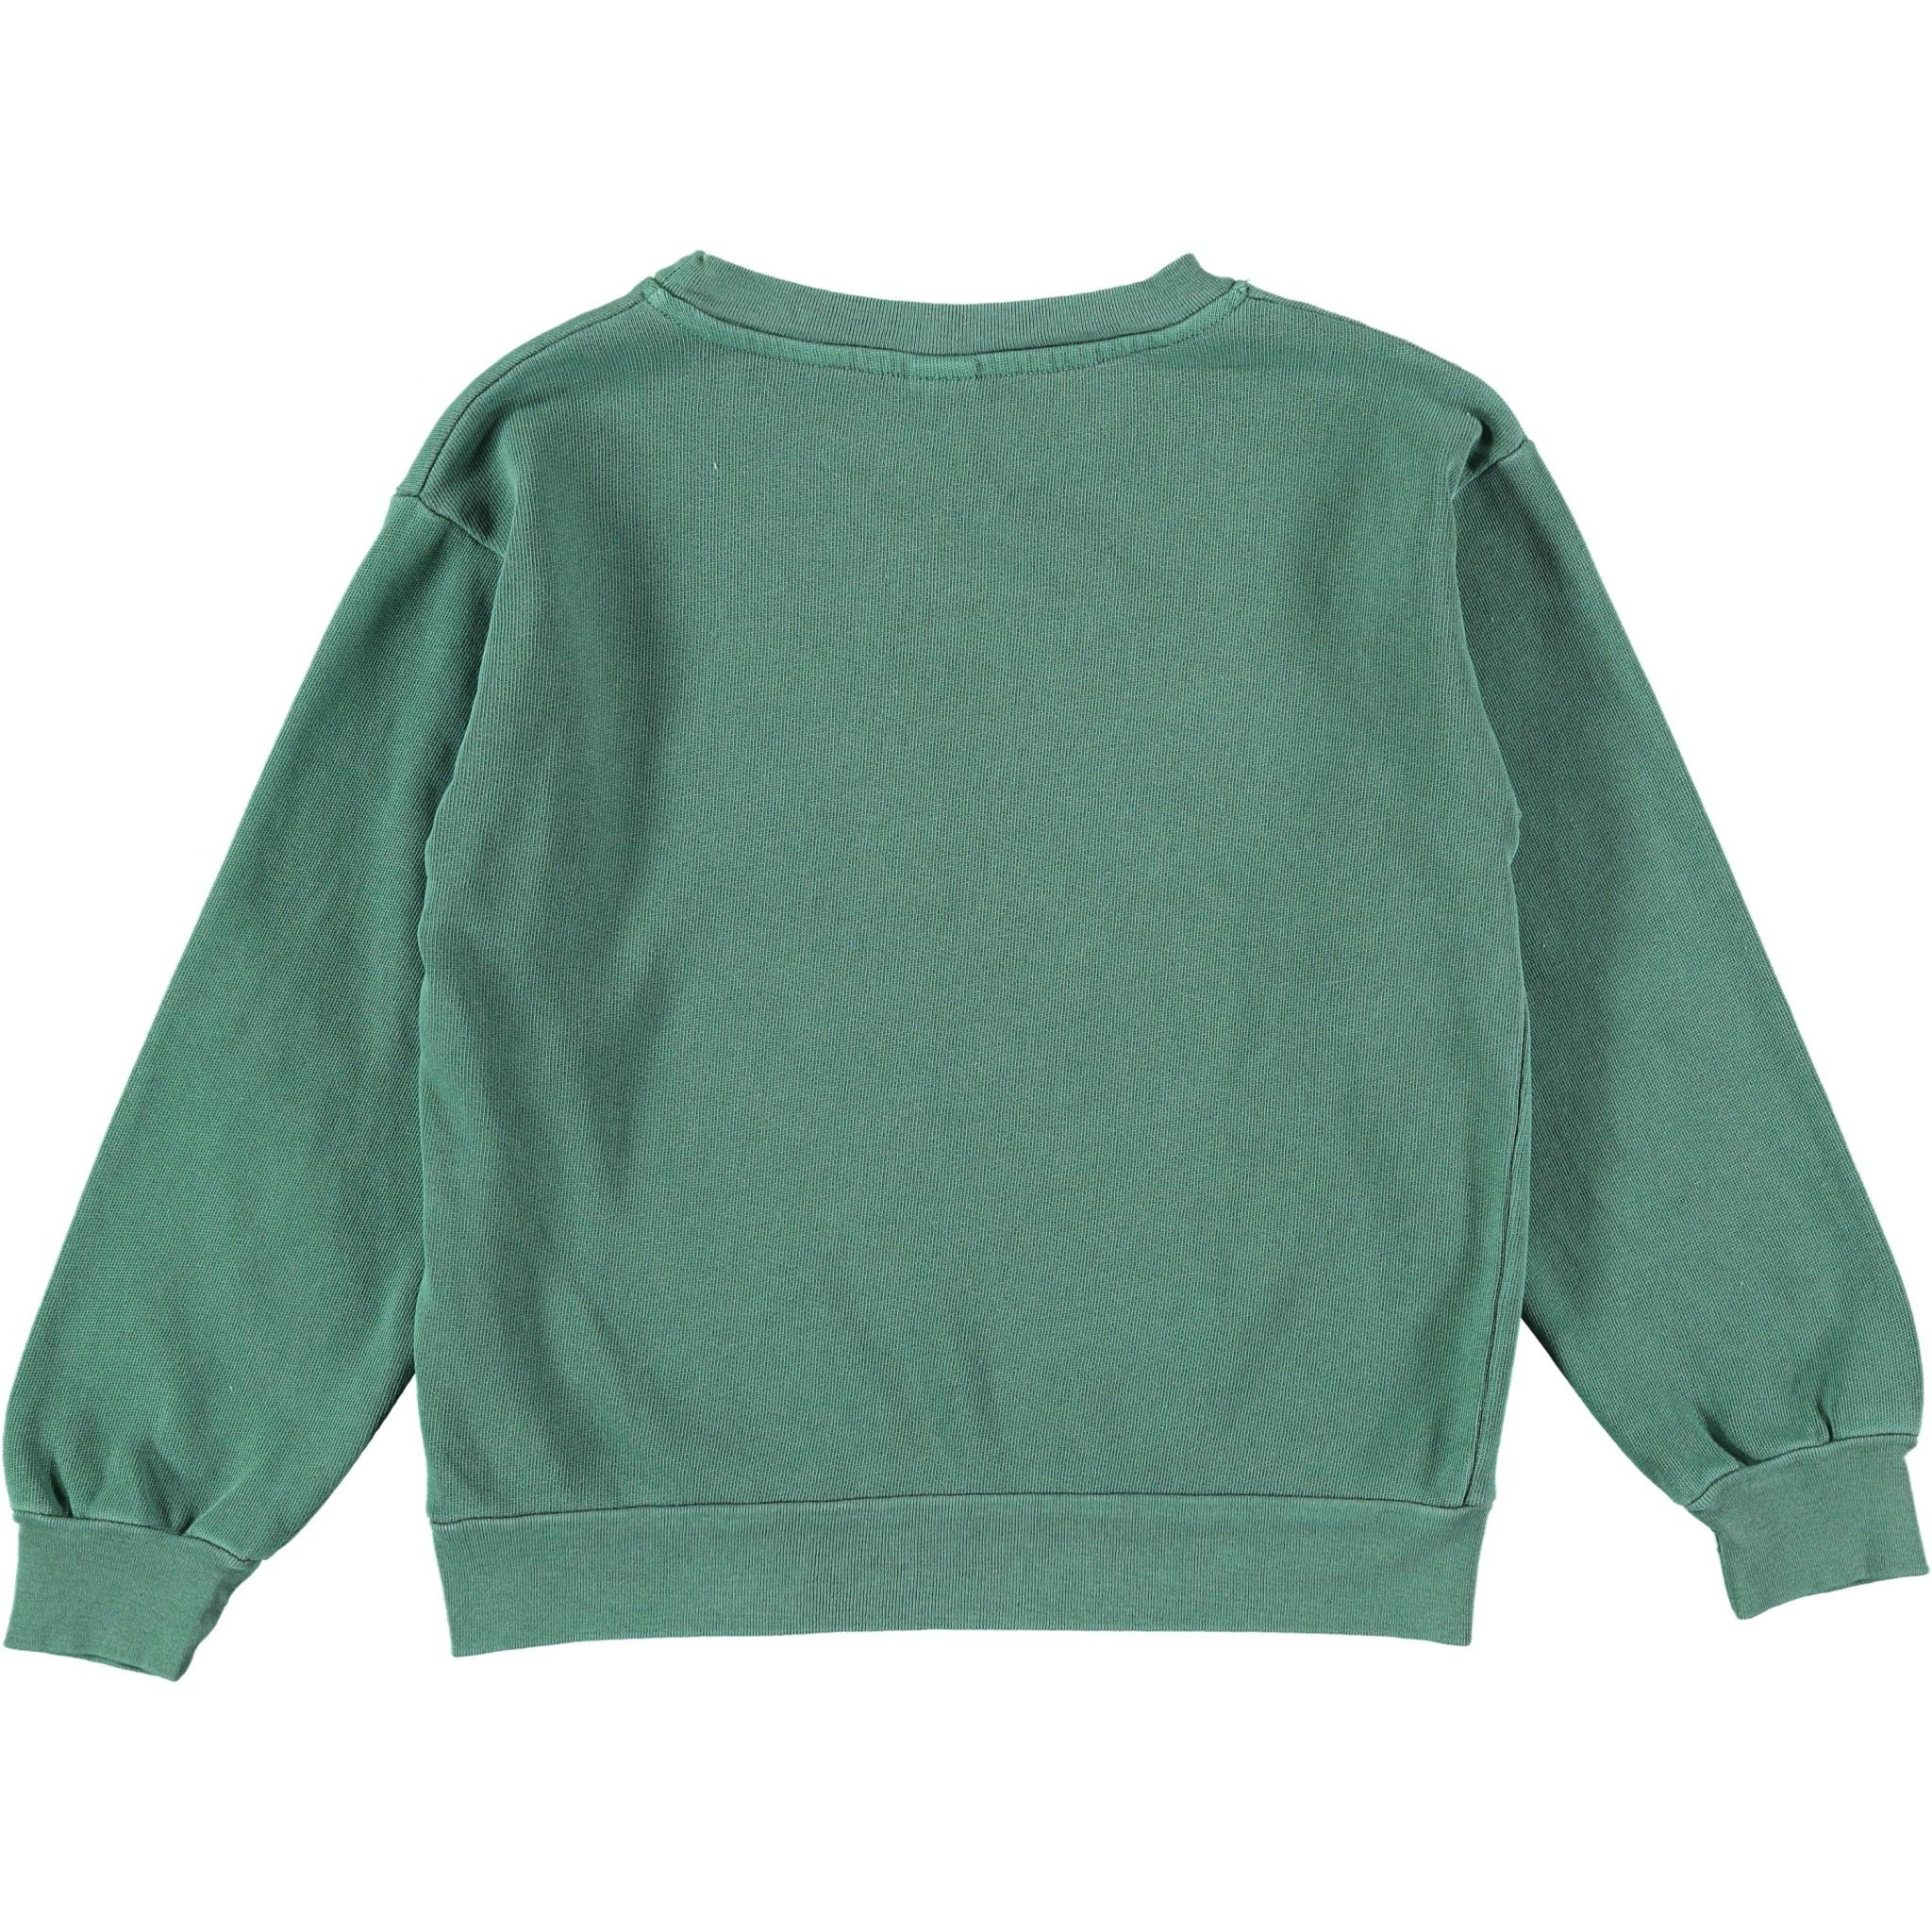 Sweatshirt bonmot mountain greenlake-2